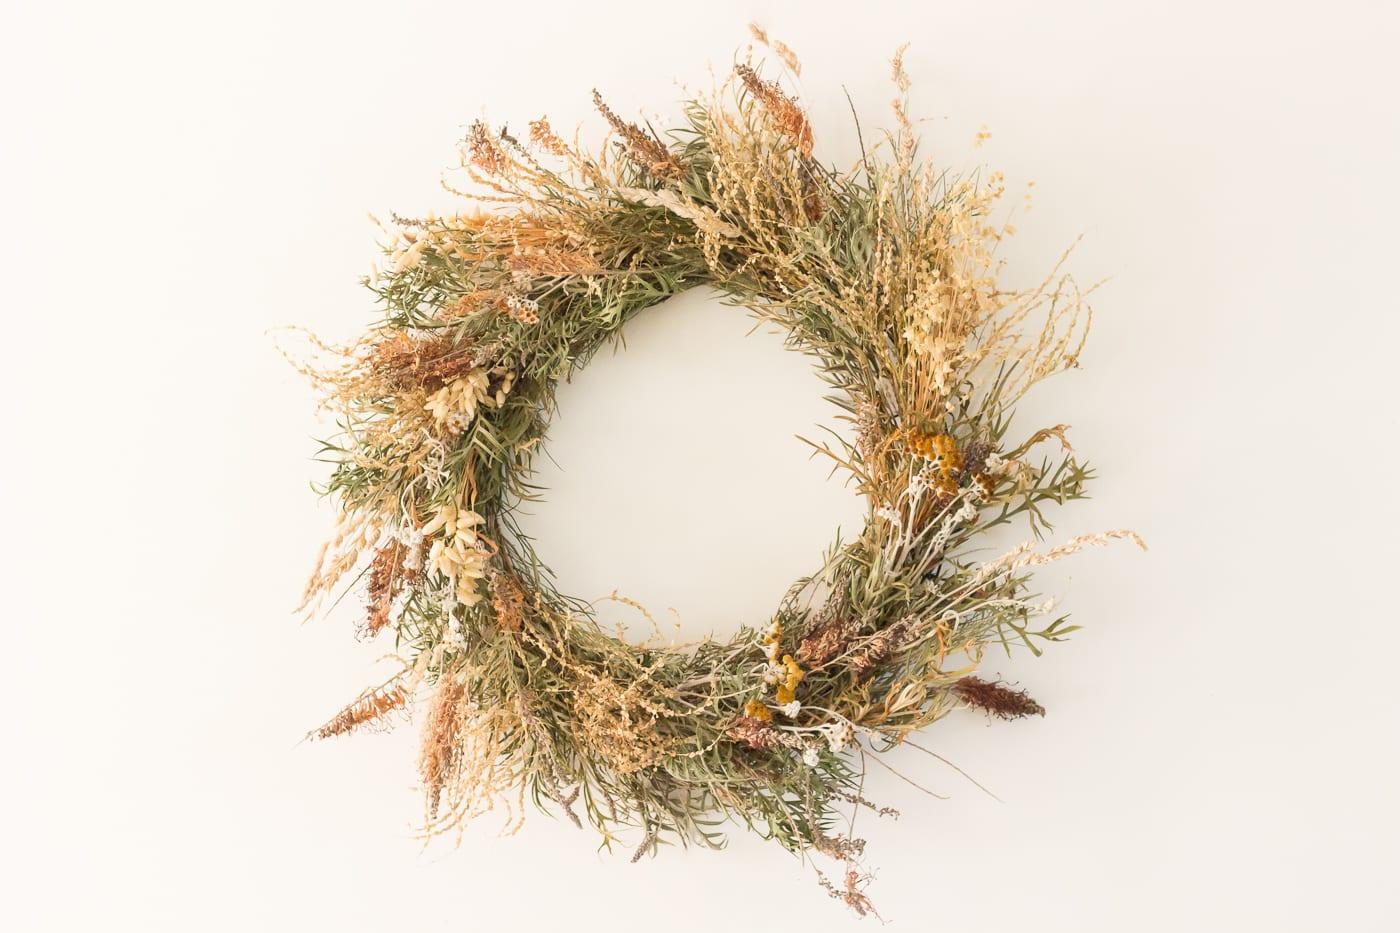 Banksia wreath (1 of 1)